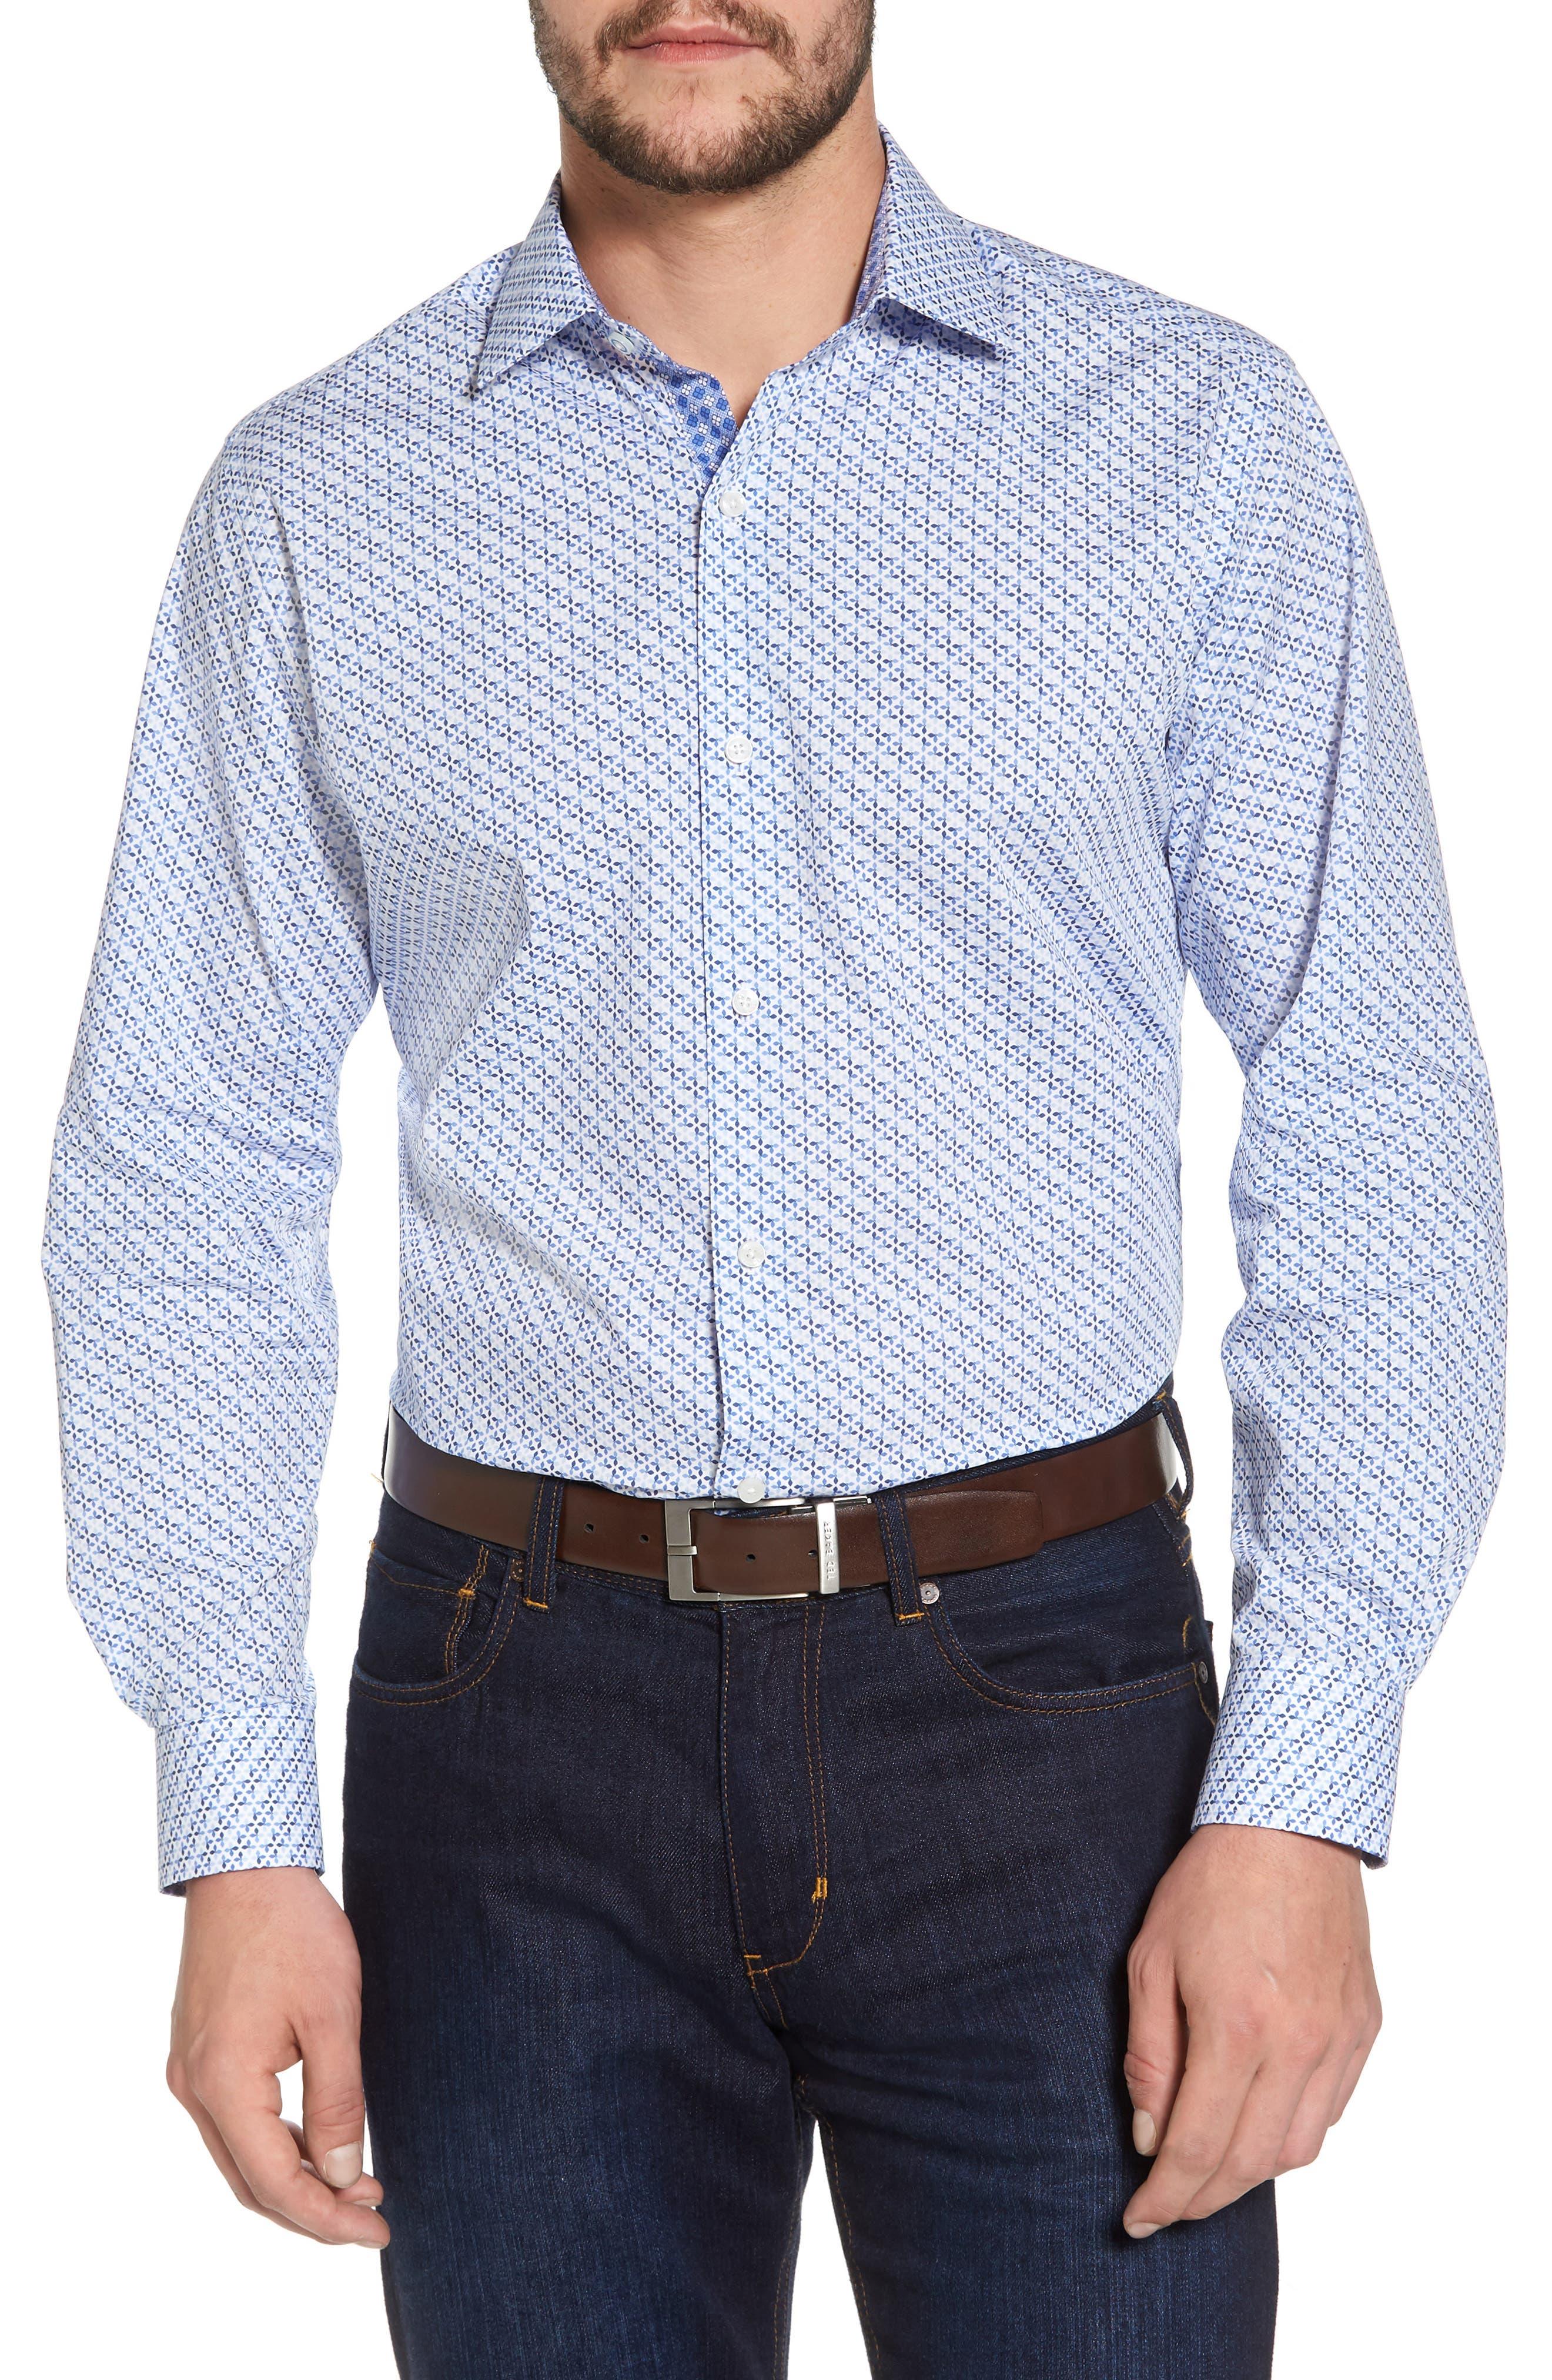 Simon Regular Fit Geo Print Sport Shirt,                             Main thumbnail 1, color,                             450